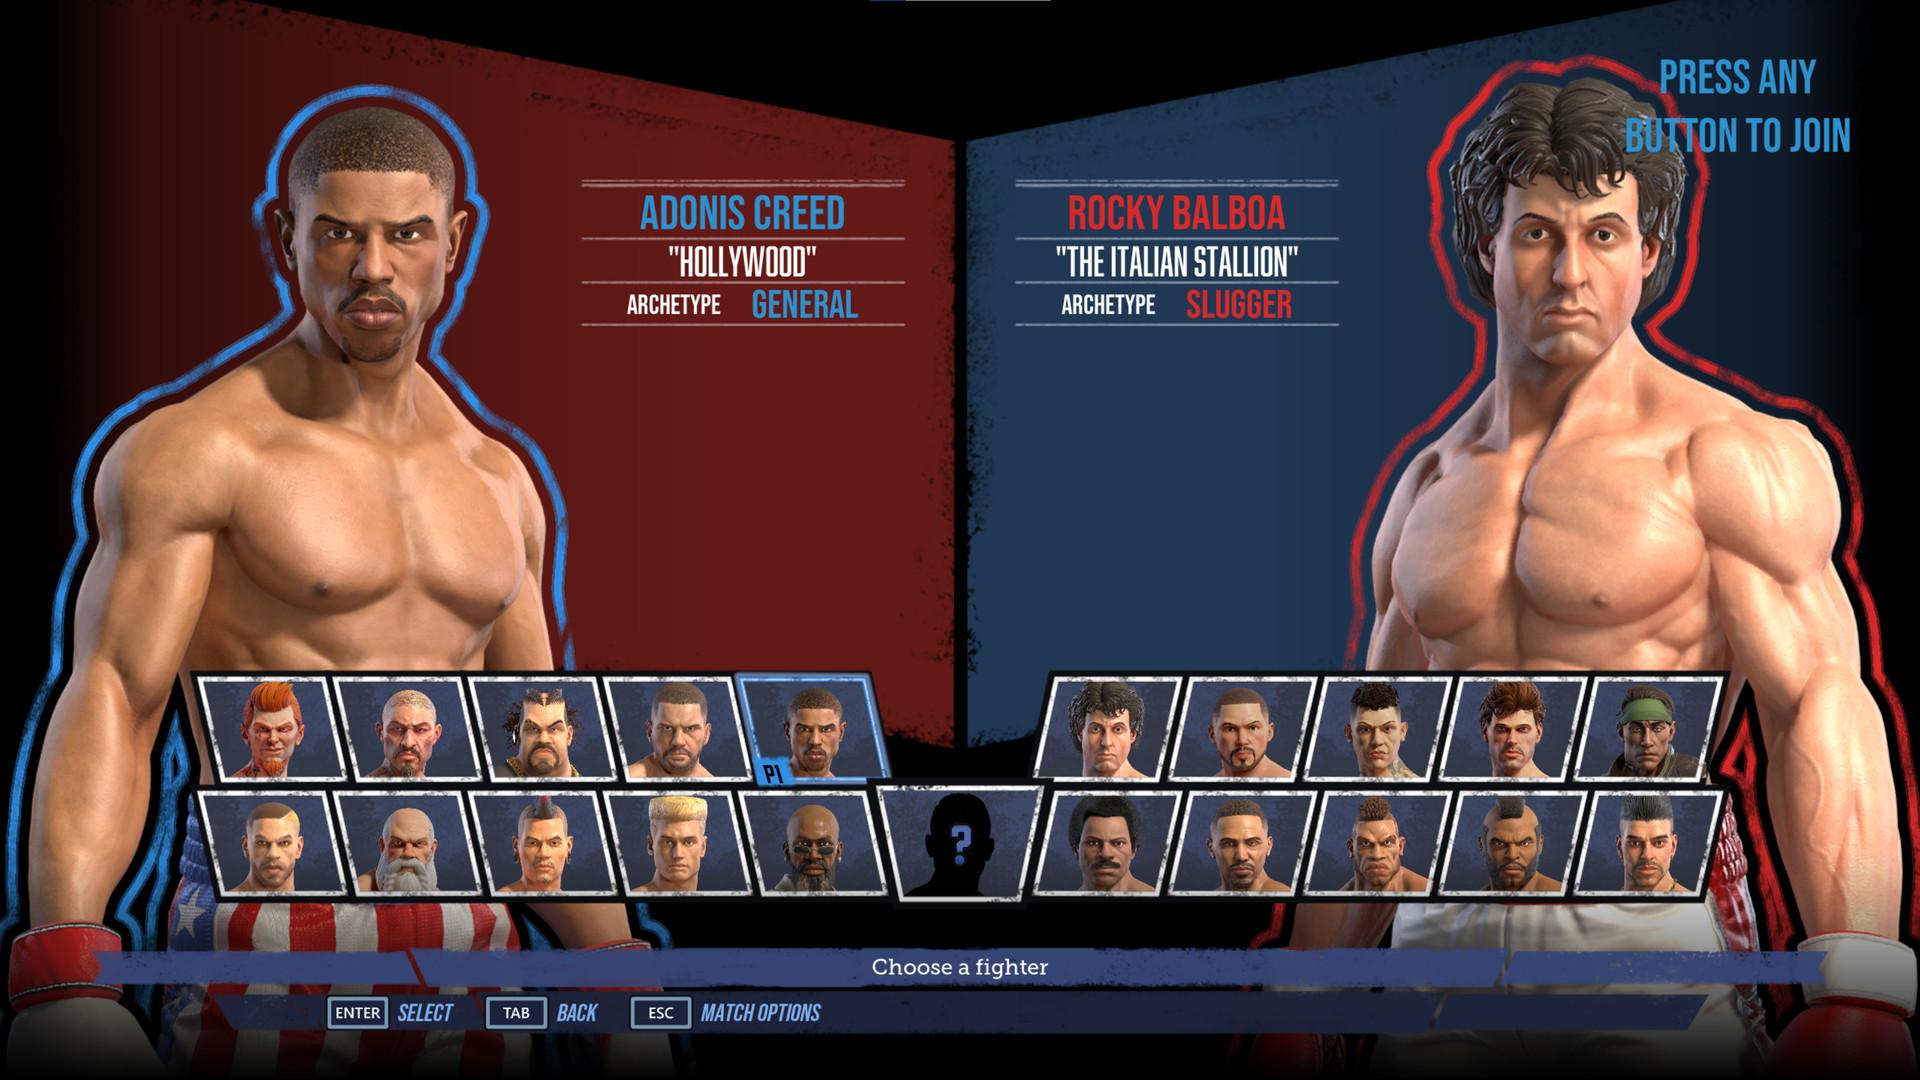 big-rumble-boxing-creed-champions-pc-screenshot-1